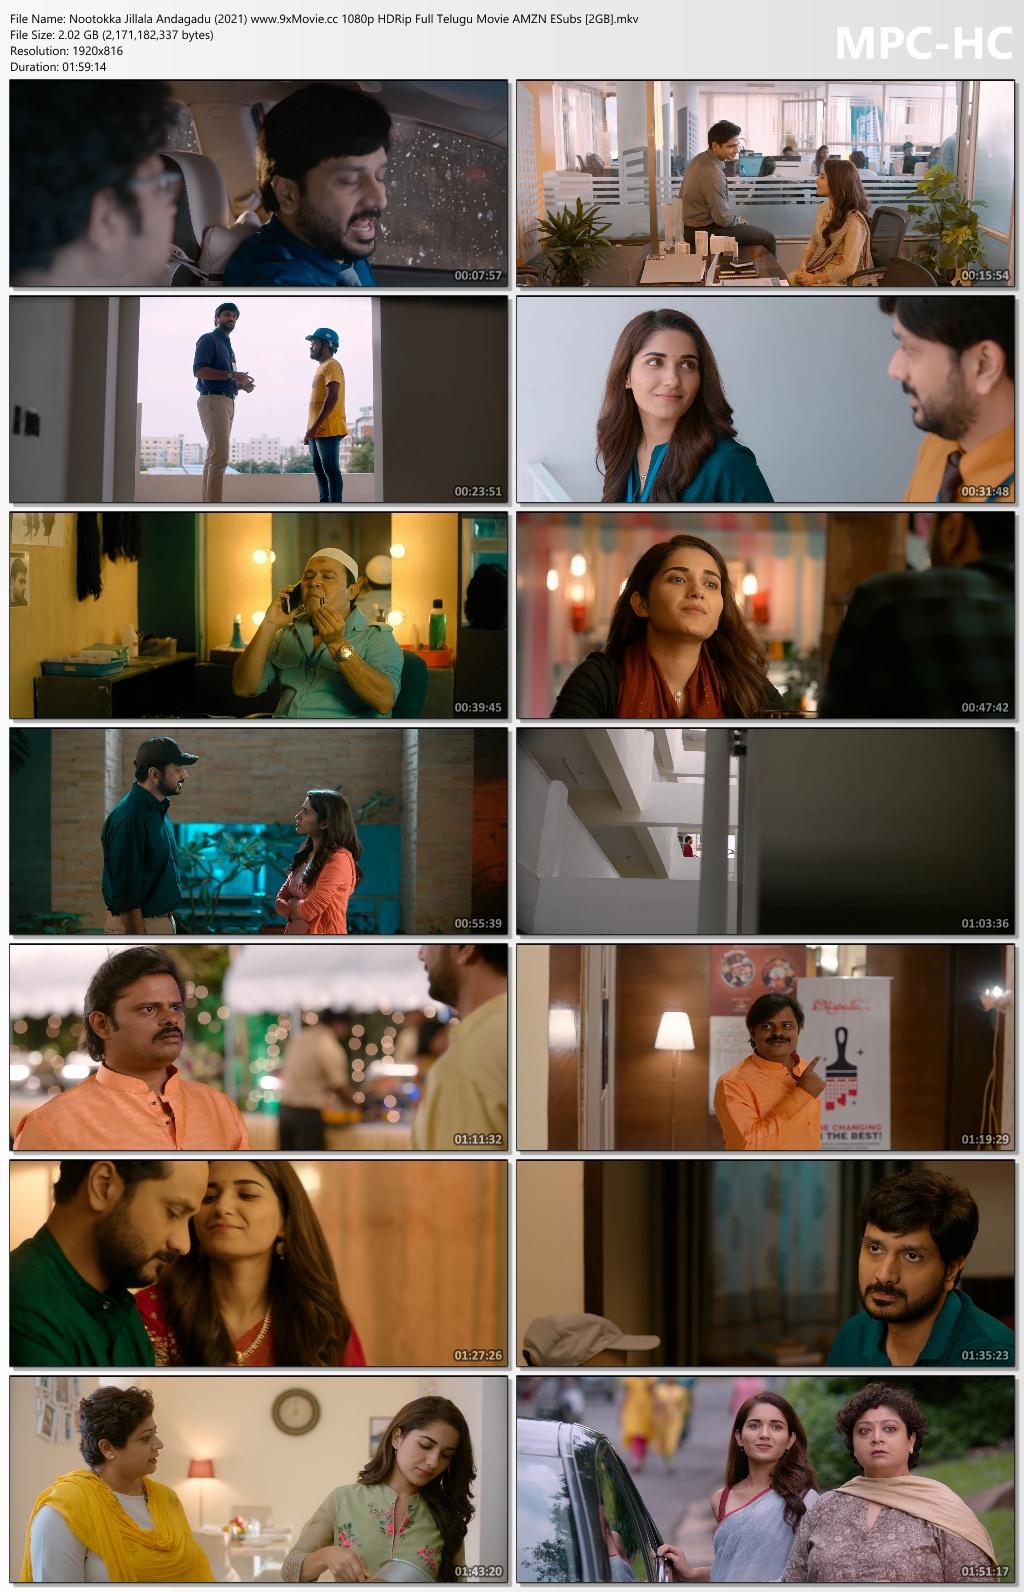 Nootokka-Jillala-Andagadu-2021-www-9x-Movie-cc-1080p-HDRip-Full-Telugu-Movie-AMZN-ESubs-2-GB-mkv